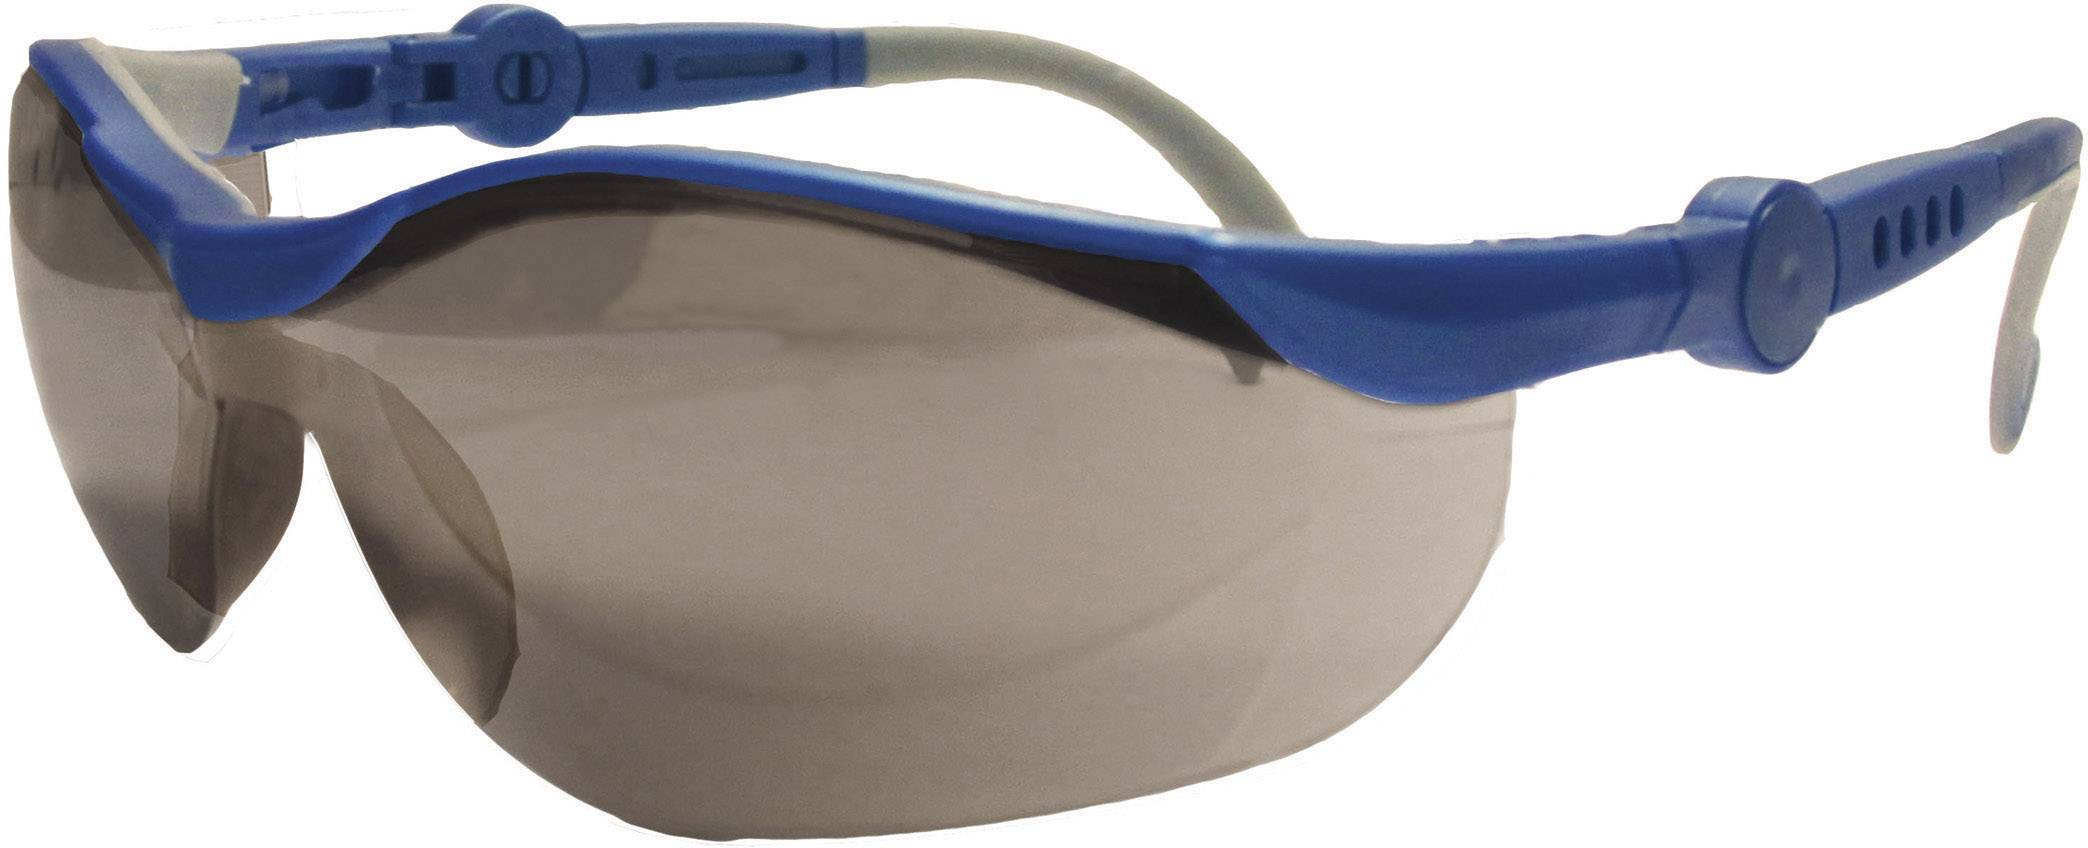 Ochranné brýle Upixx Cycle Ergonomic, 26752, zatmavené